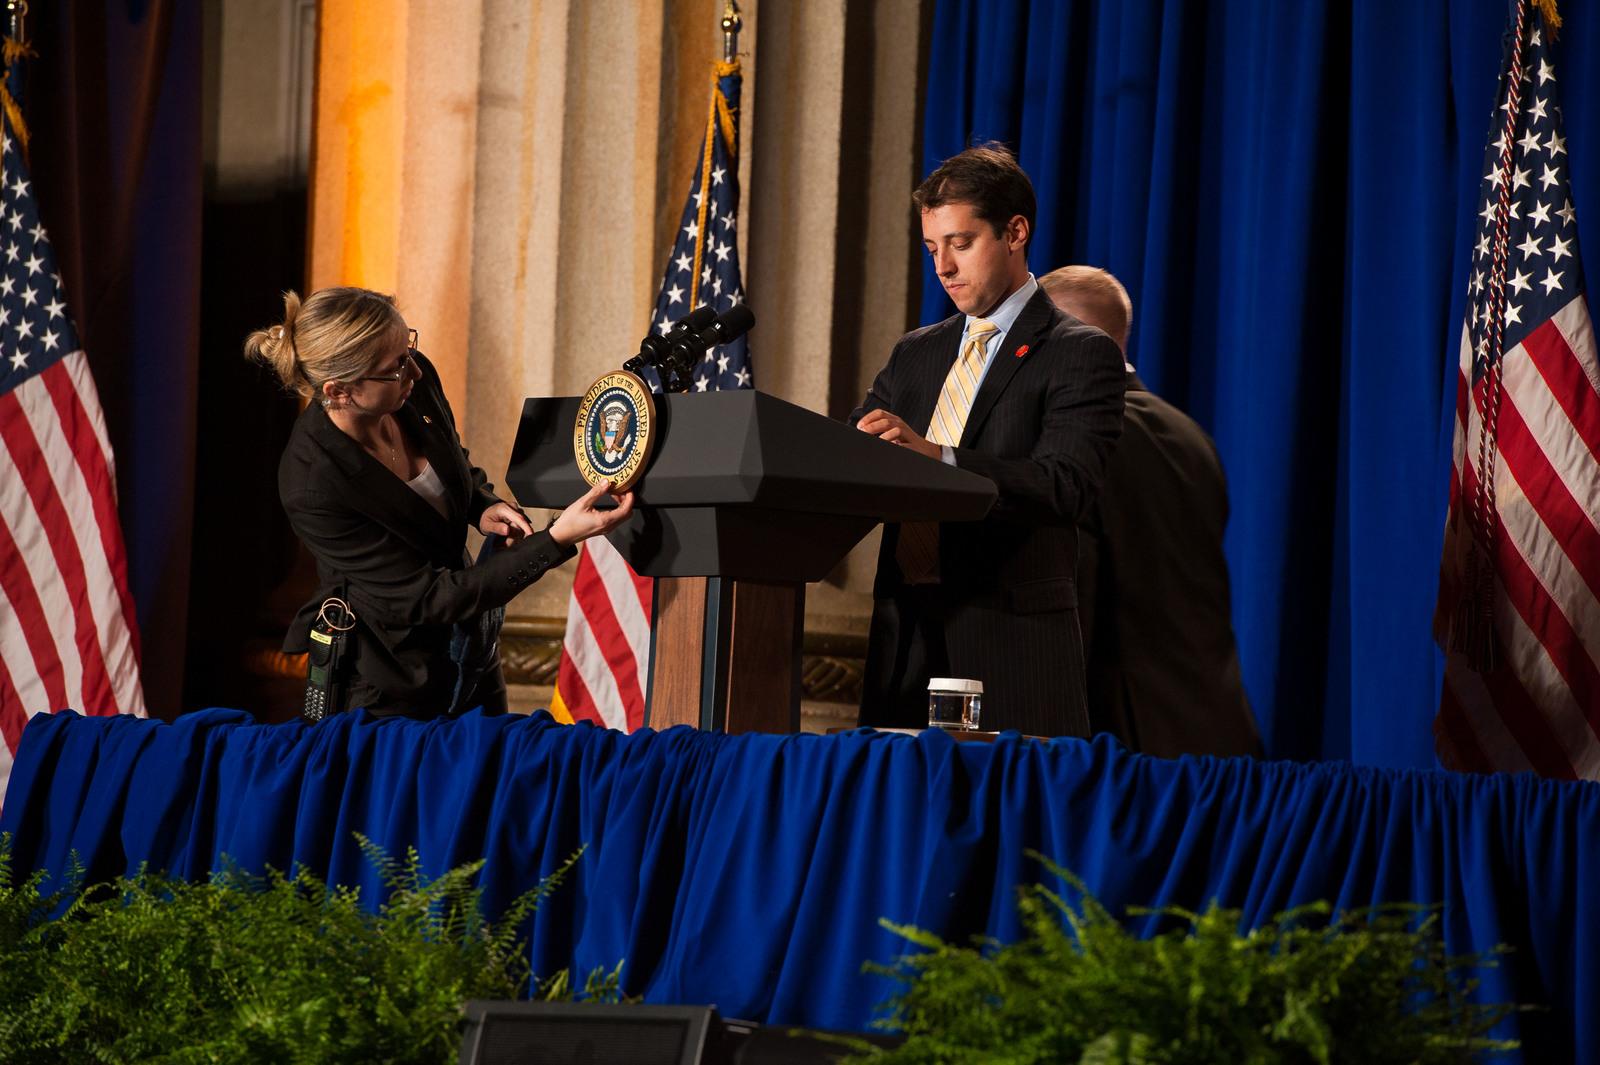 Office of the Administrator - President Obama [412-APD-1097-2012-12-10_PresidentObama_031.jpg]